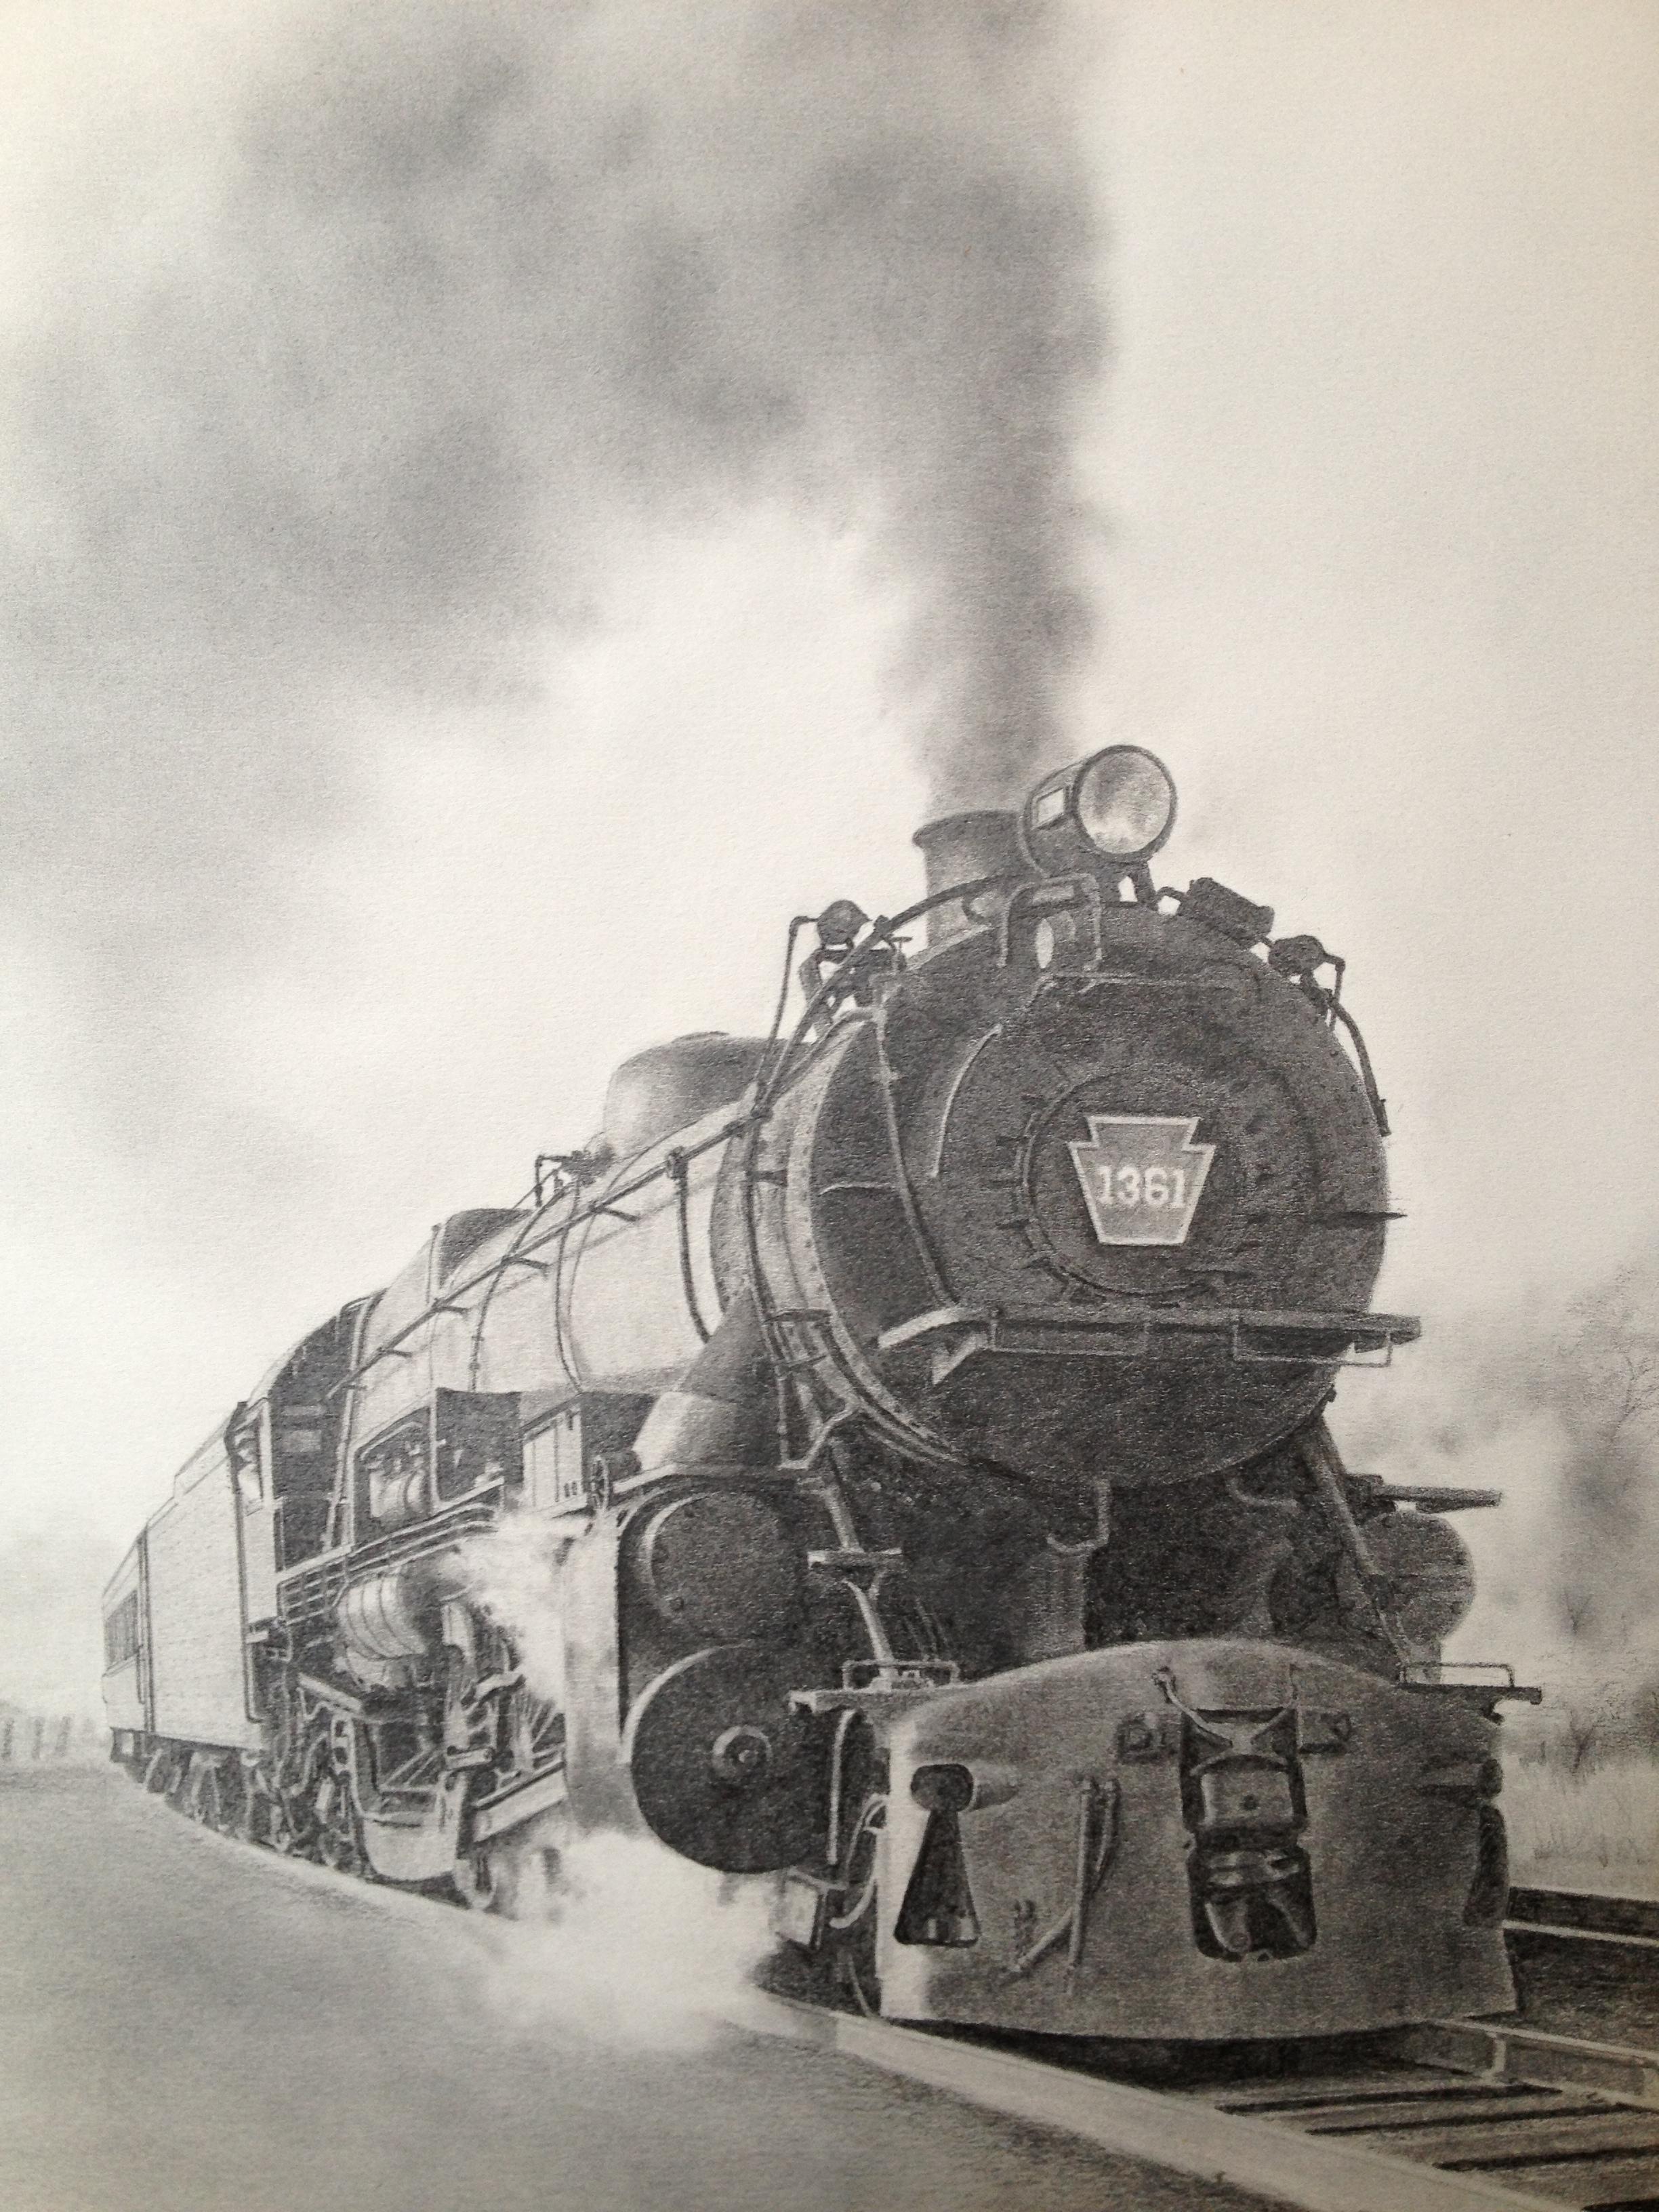 2448x3264 Pennsylvania Railroad K 4 Steam Locomotive 1361. Pencil Drawing